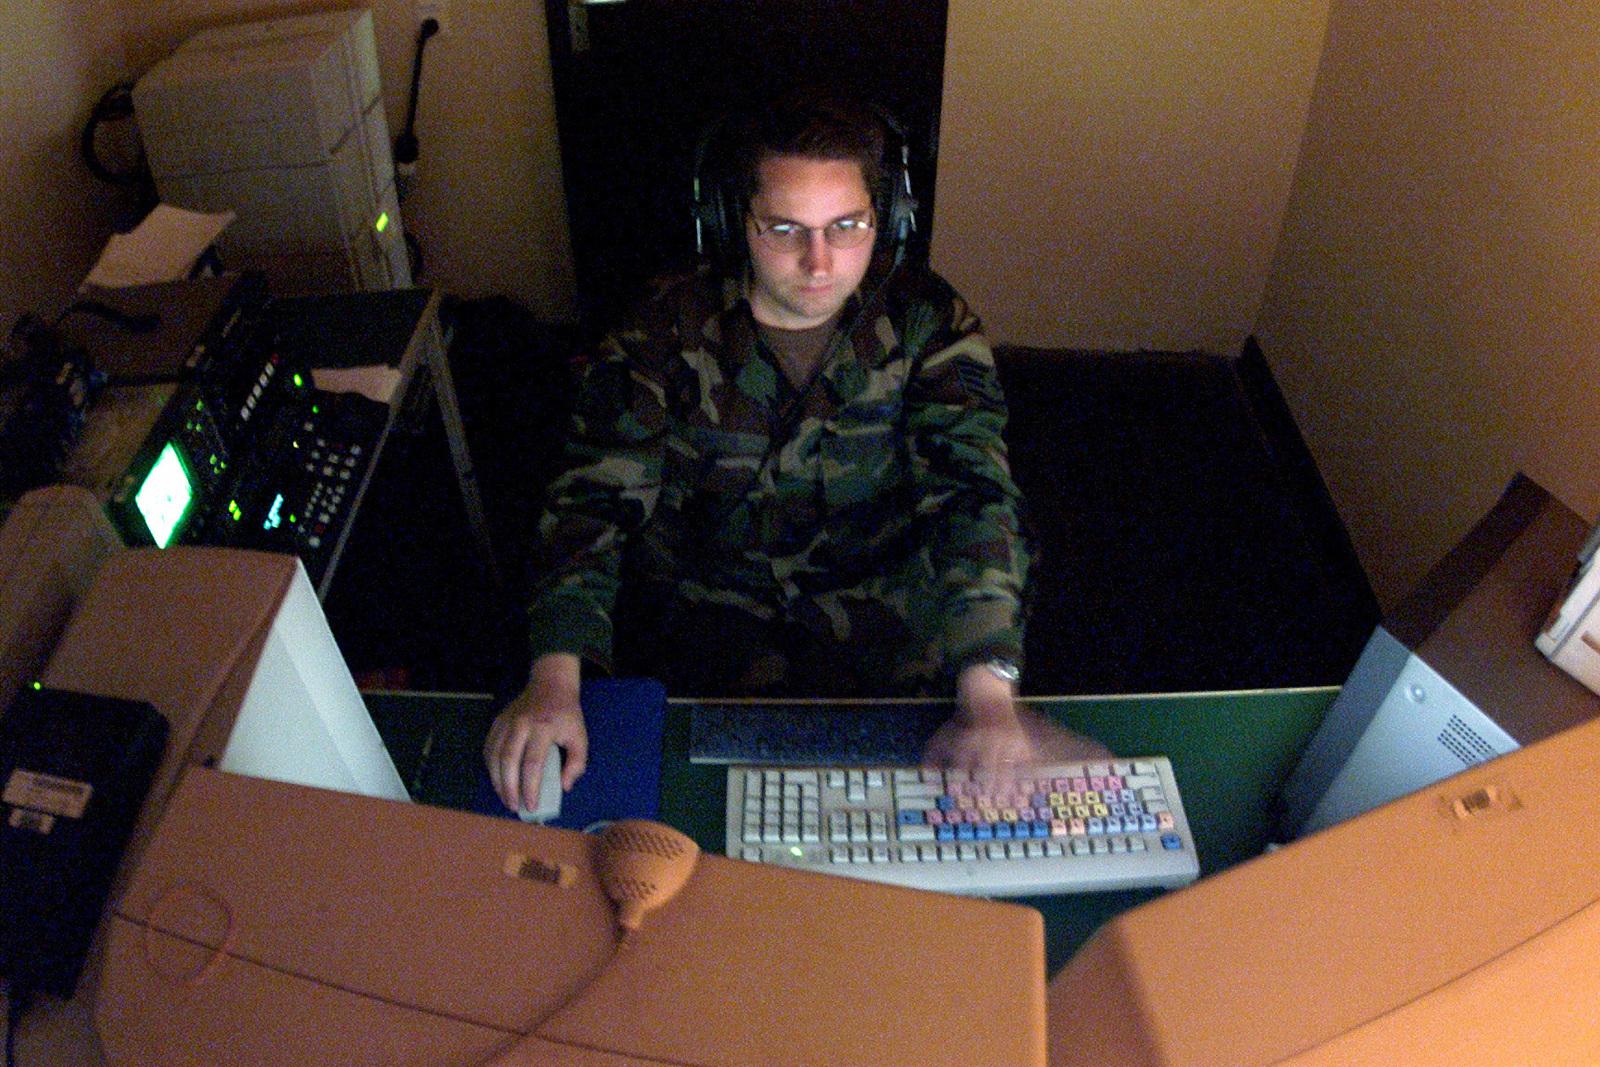 STAFF Sergeant (SSGT) Mike Smith, USAF, 1ST Combat Camera